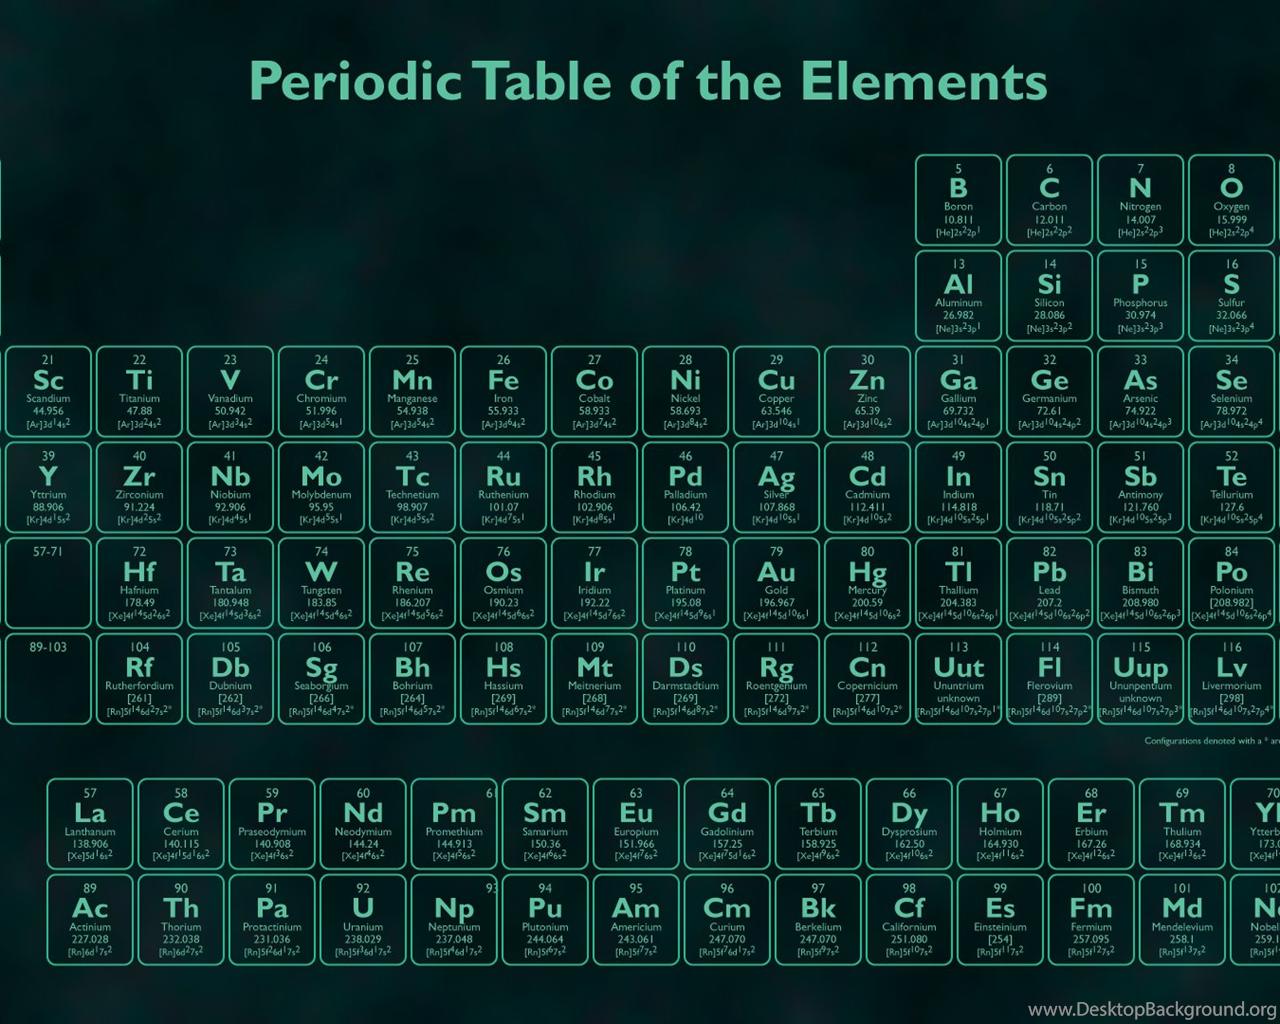 1440x900 periodic table wallpaper - photo #11